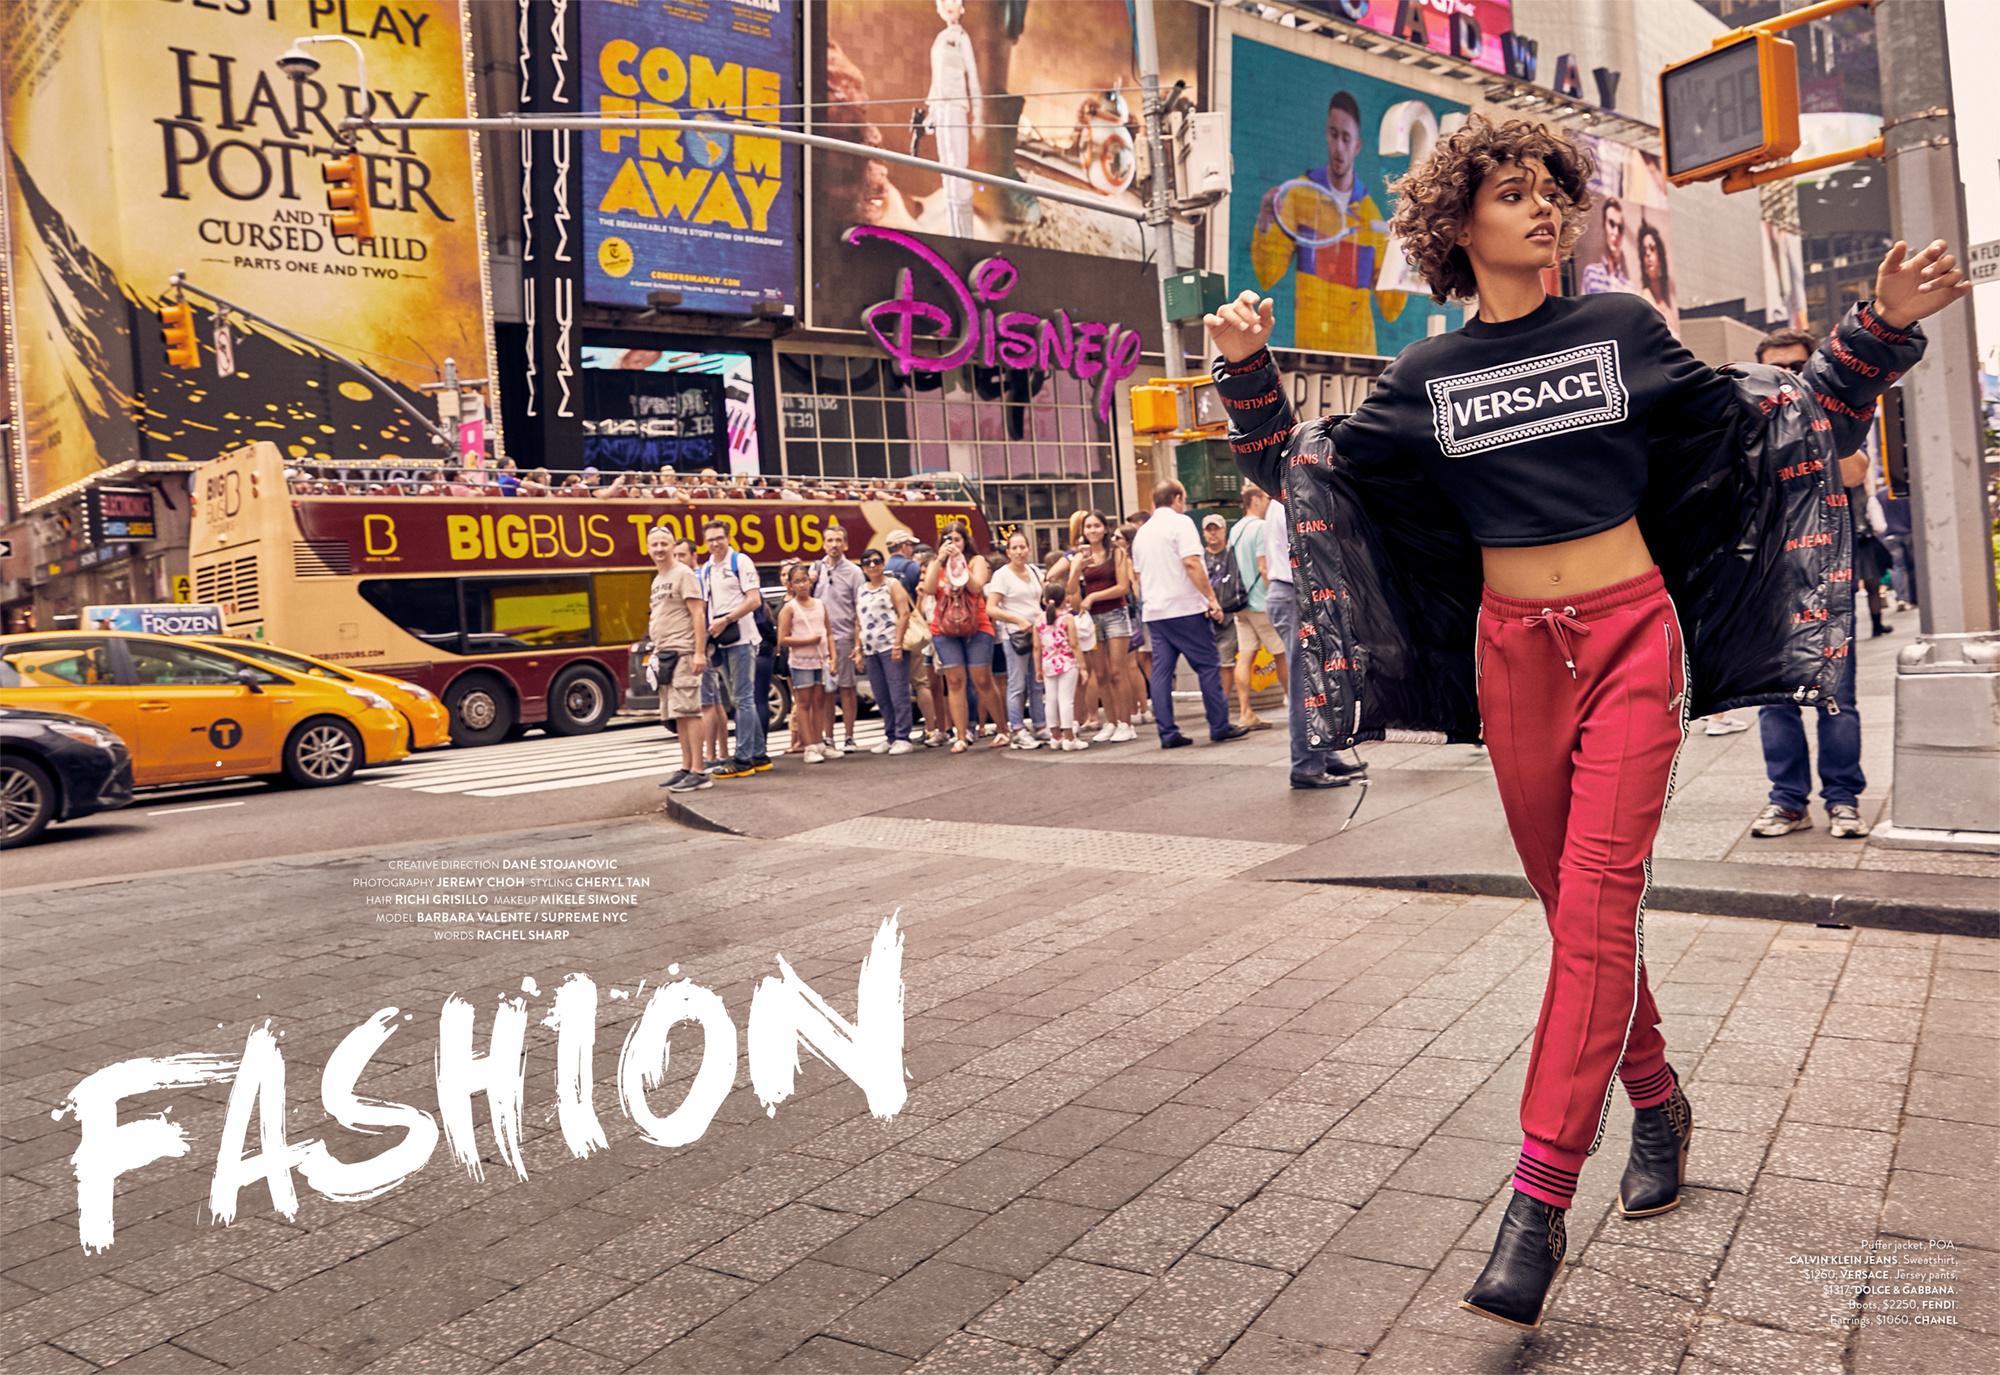 GZ1804_p053_Fashion_News_FN2_1_-1.jpg